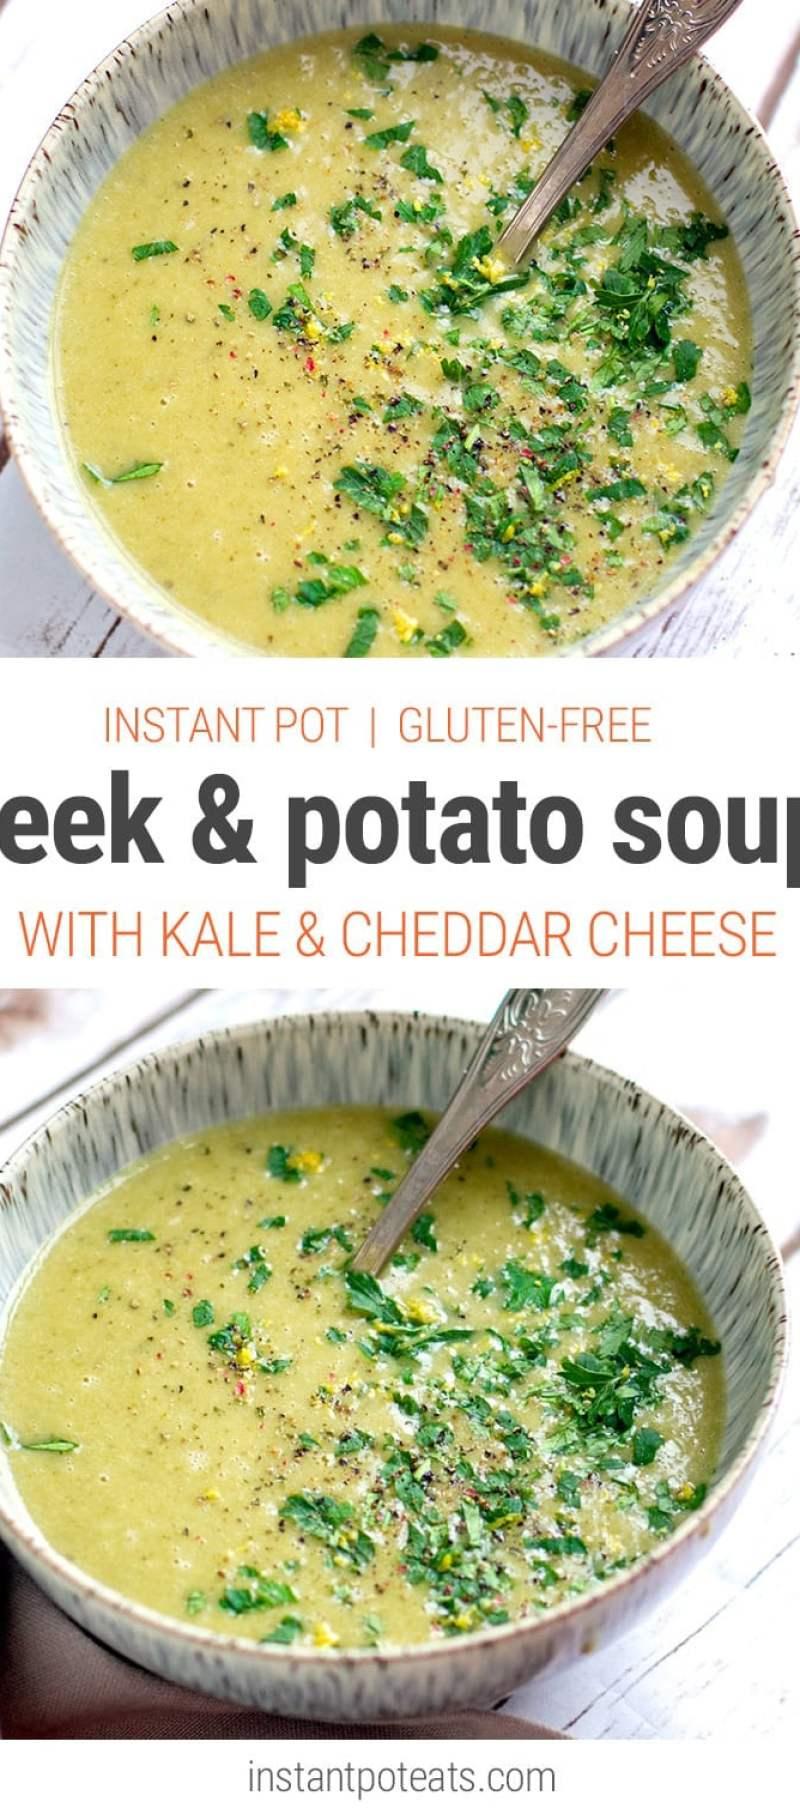 Leek, Kale & Potato Soup (Instant Pot, Gluten-Free Recipe)